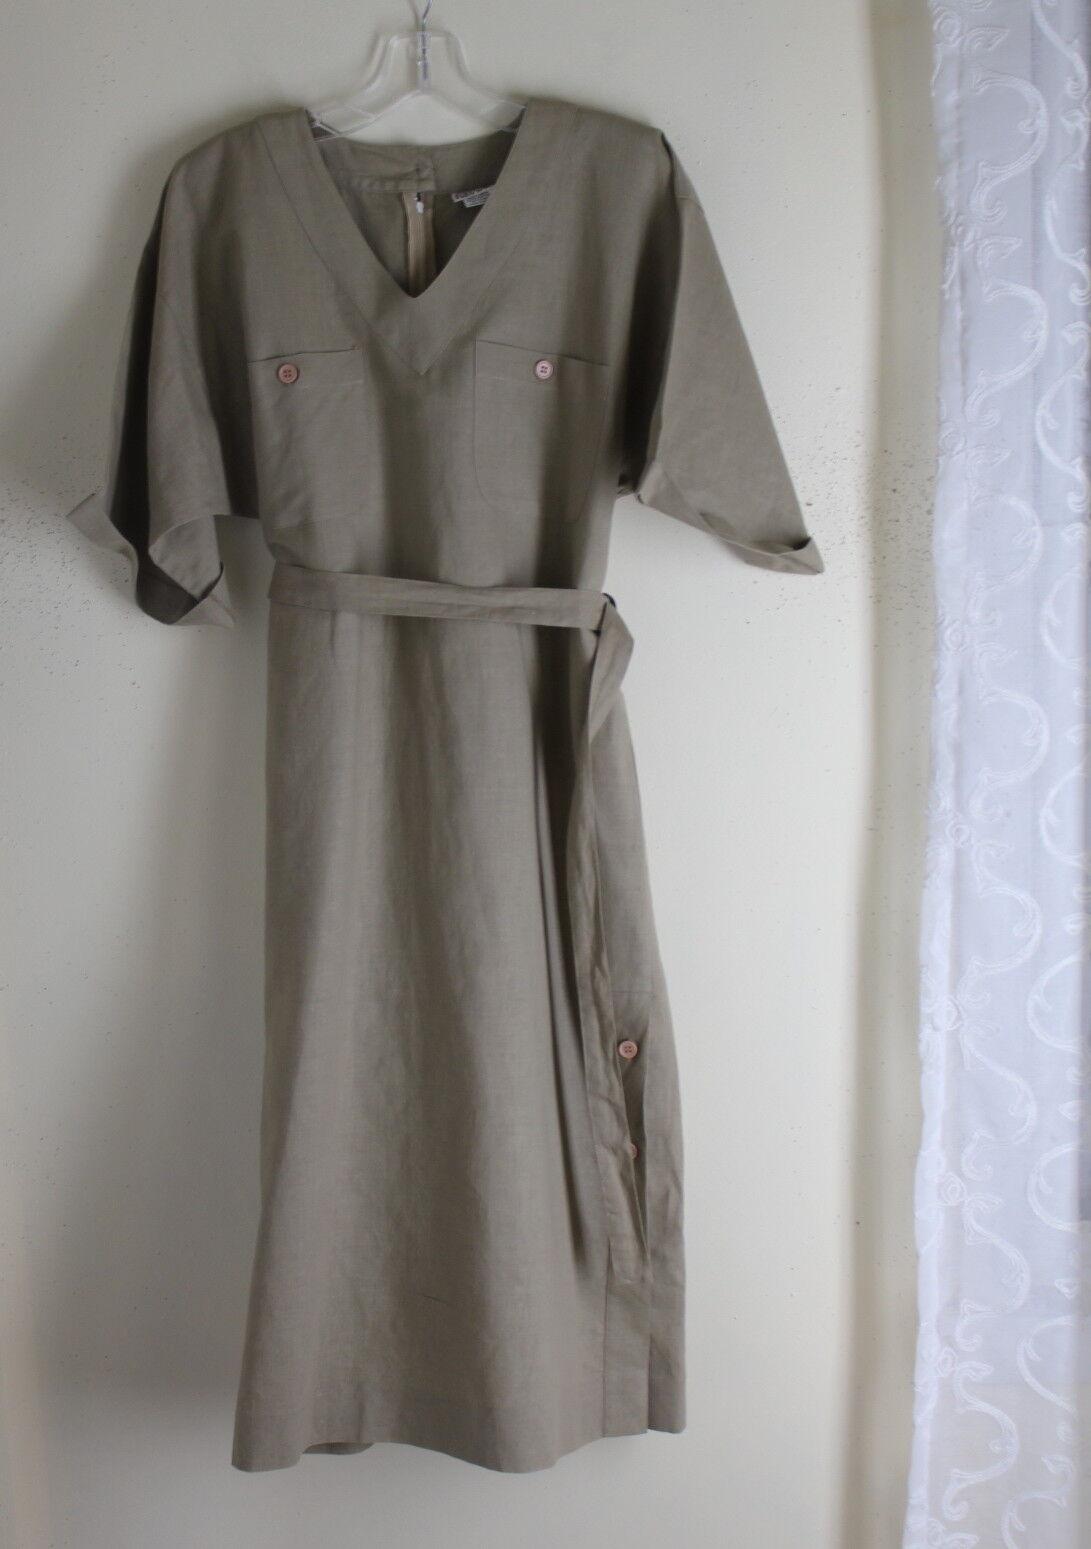 Frances Henaghan 8 M Linen-Cotton Minimalist 80s VTG Artsy Lagenlook Shirt Dress